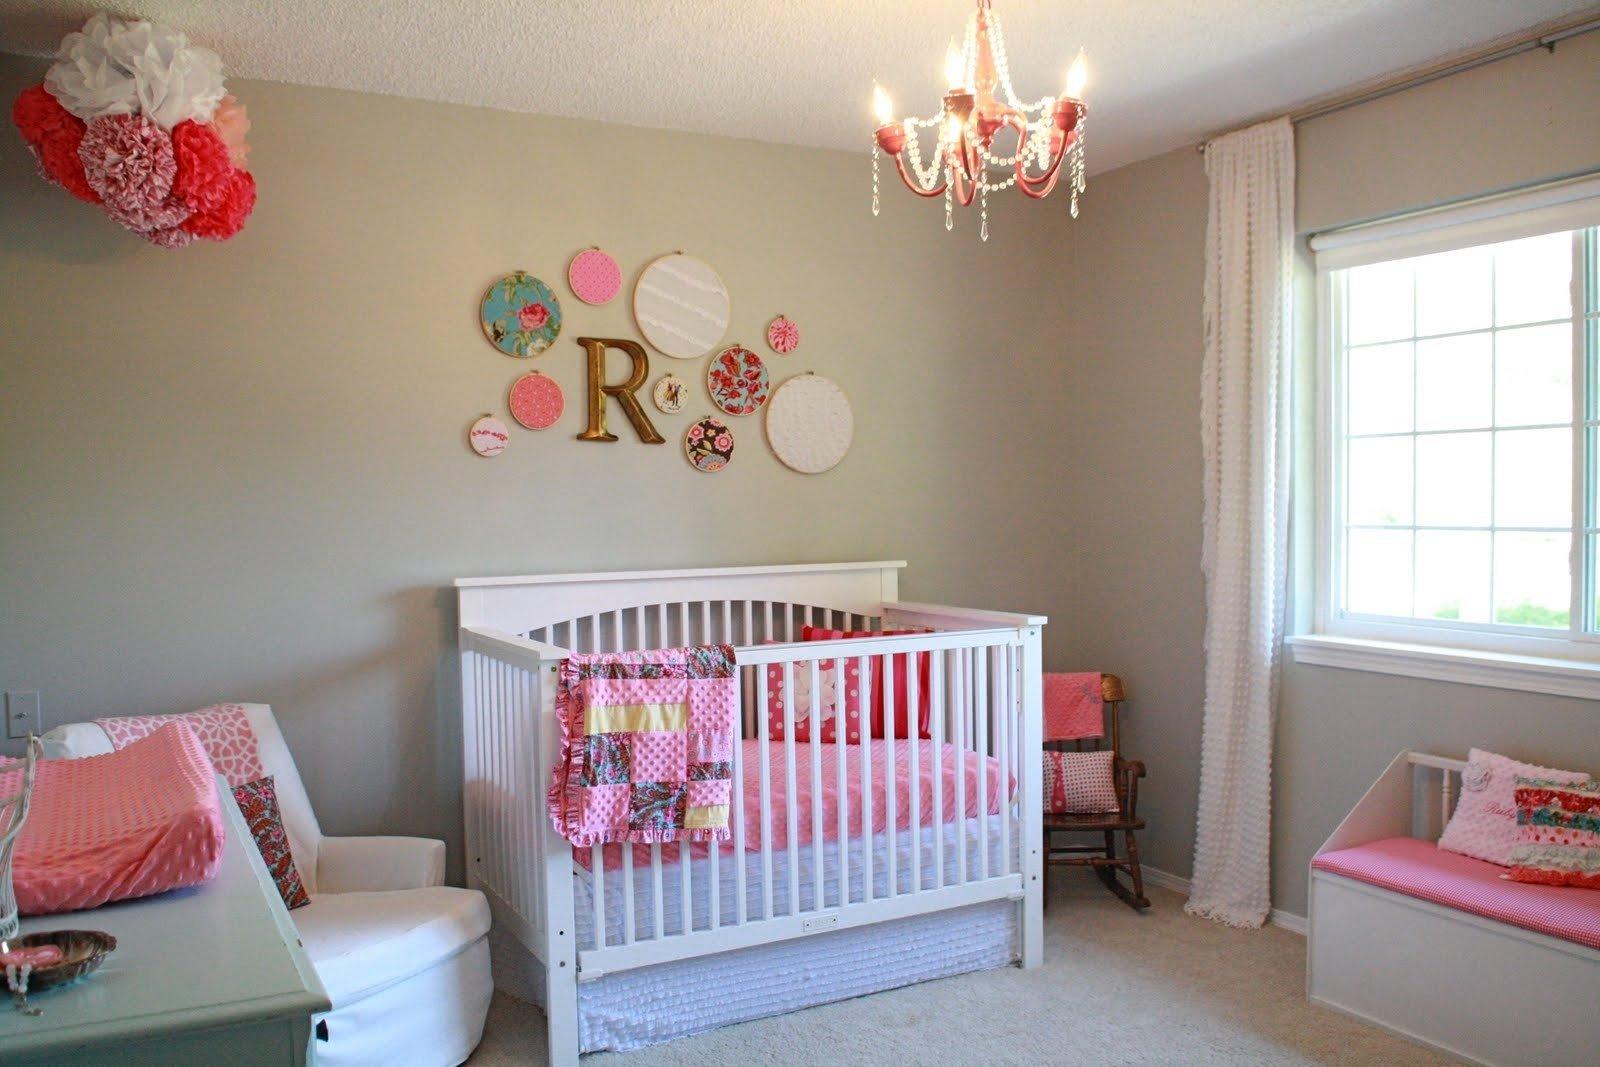 10 Wonderful Baby Girl Nursery Decorating Ideas baby girl bedrooms decorating ideas interior4you 2020